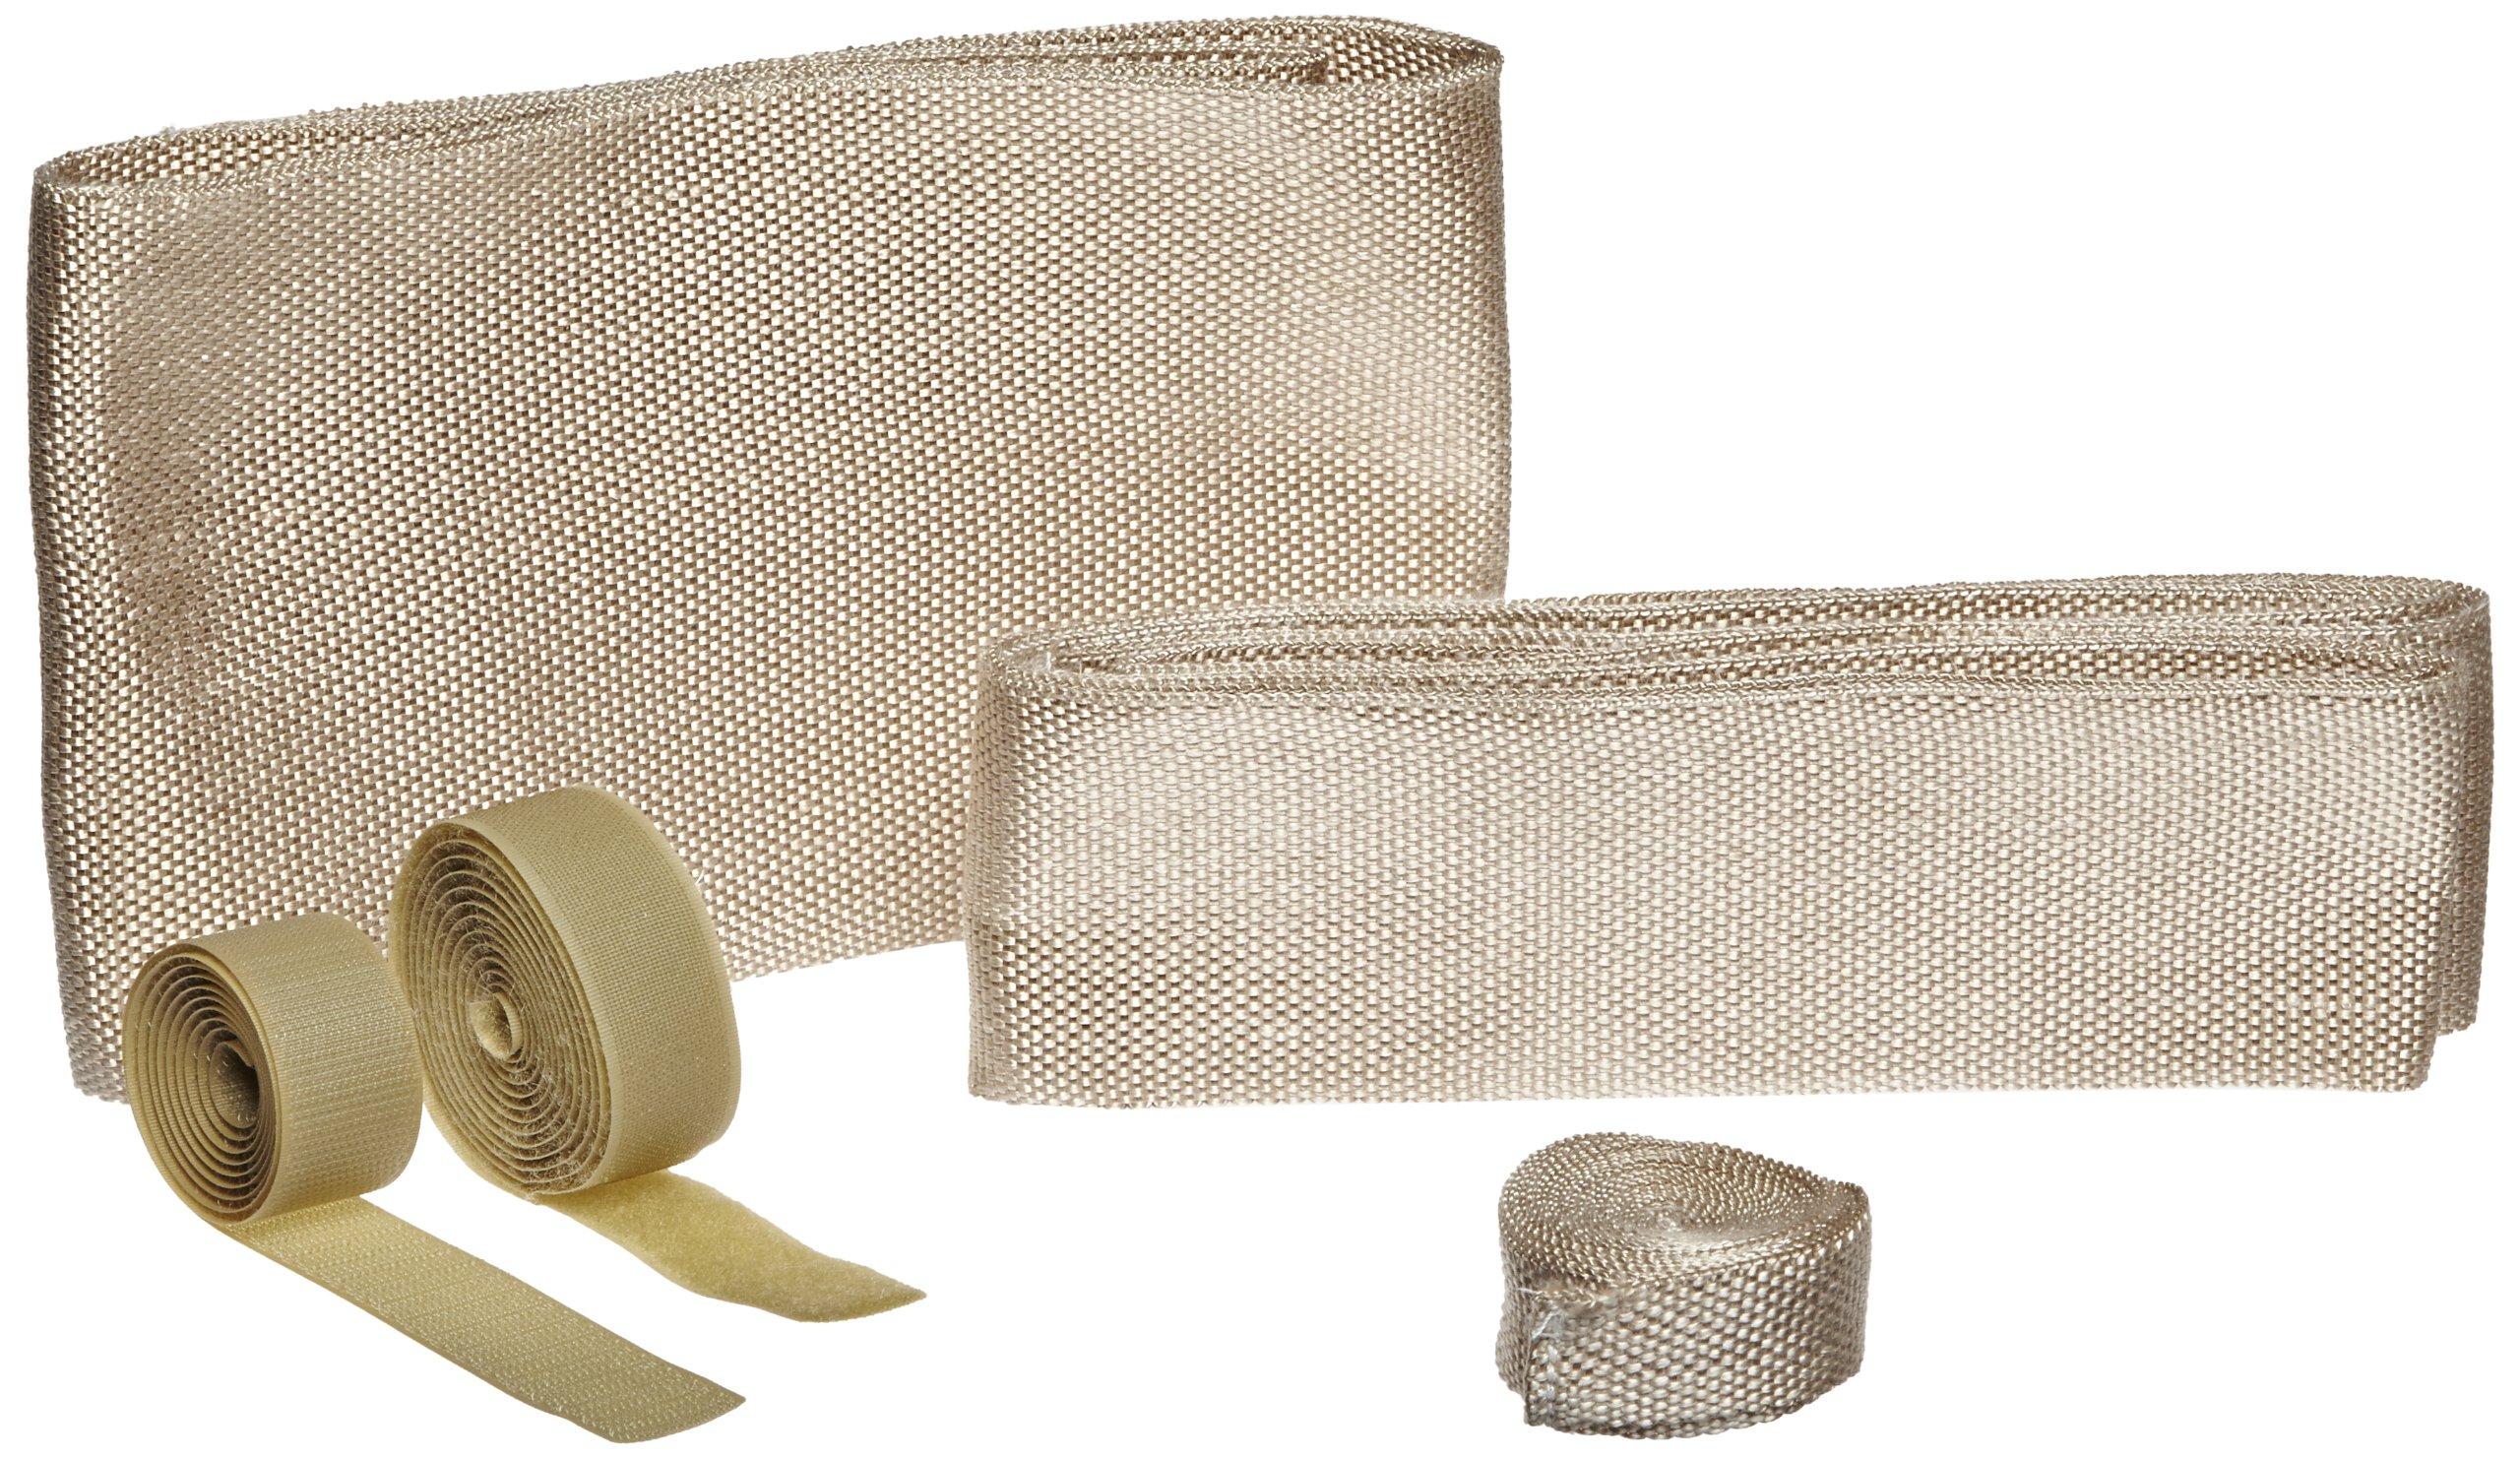 Glas-Col InsulEze 100G IK210 Insulating Kit includes 3 x 1/32'' Thick Fiberglass Tape